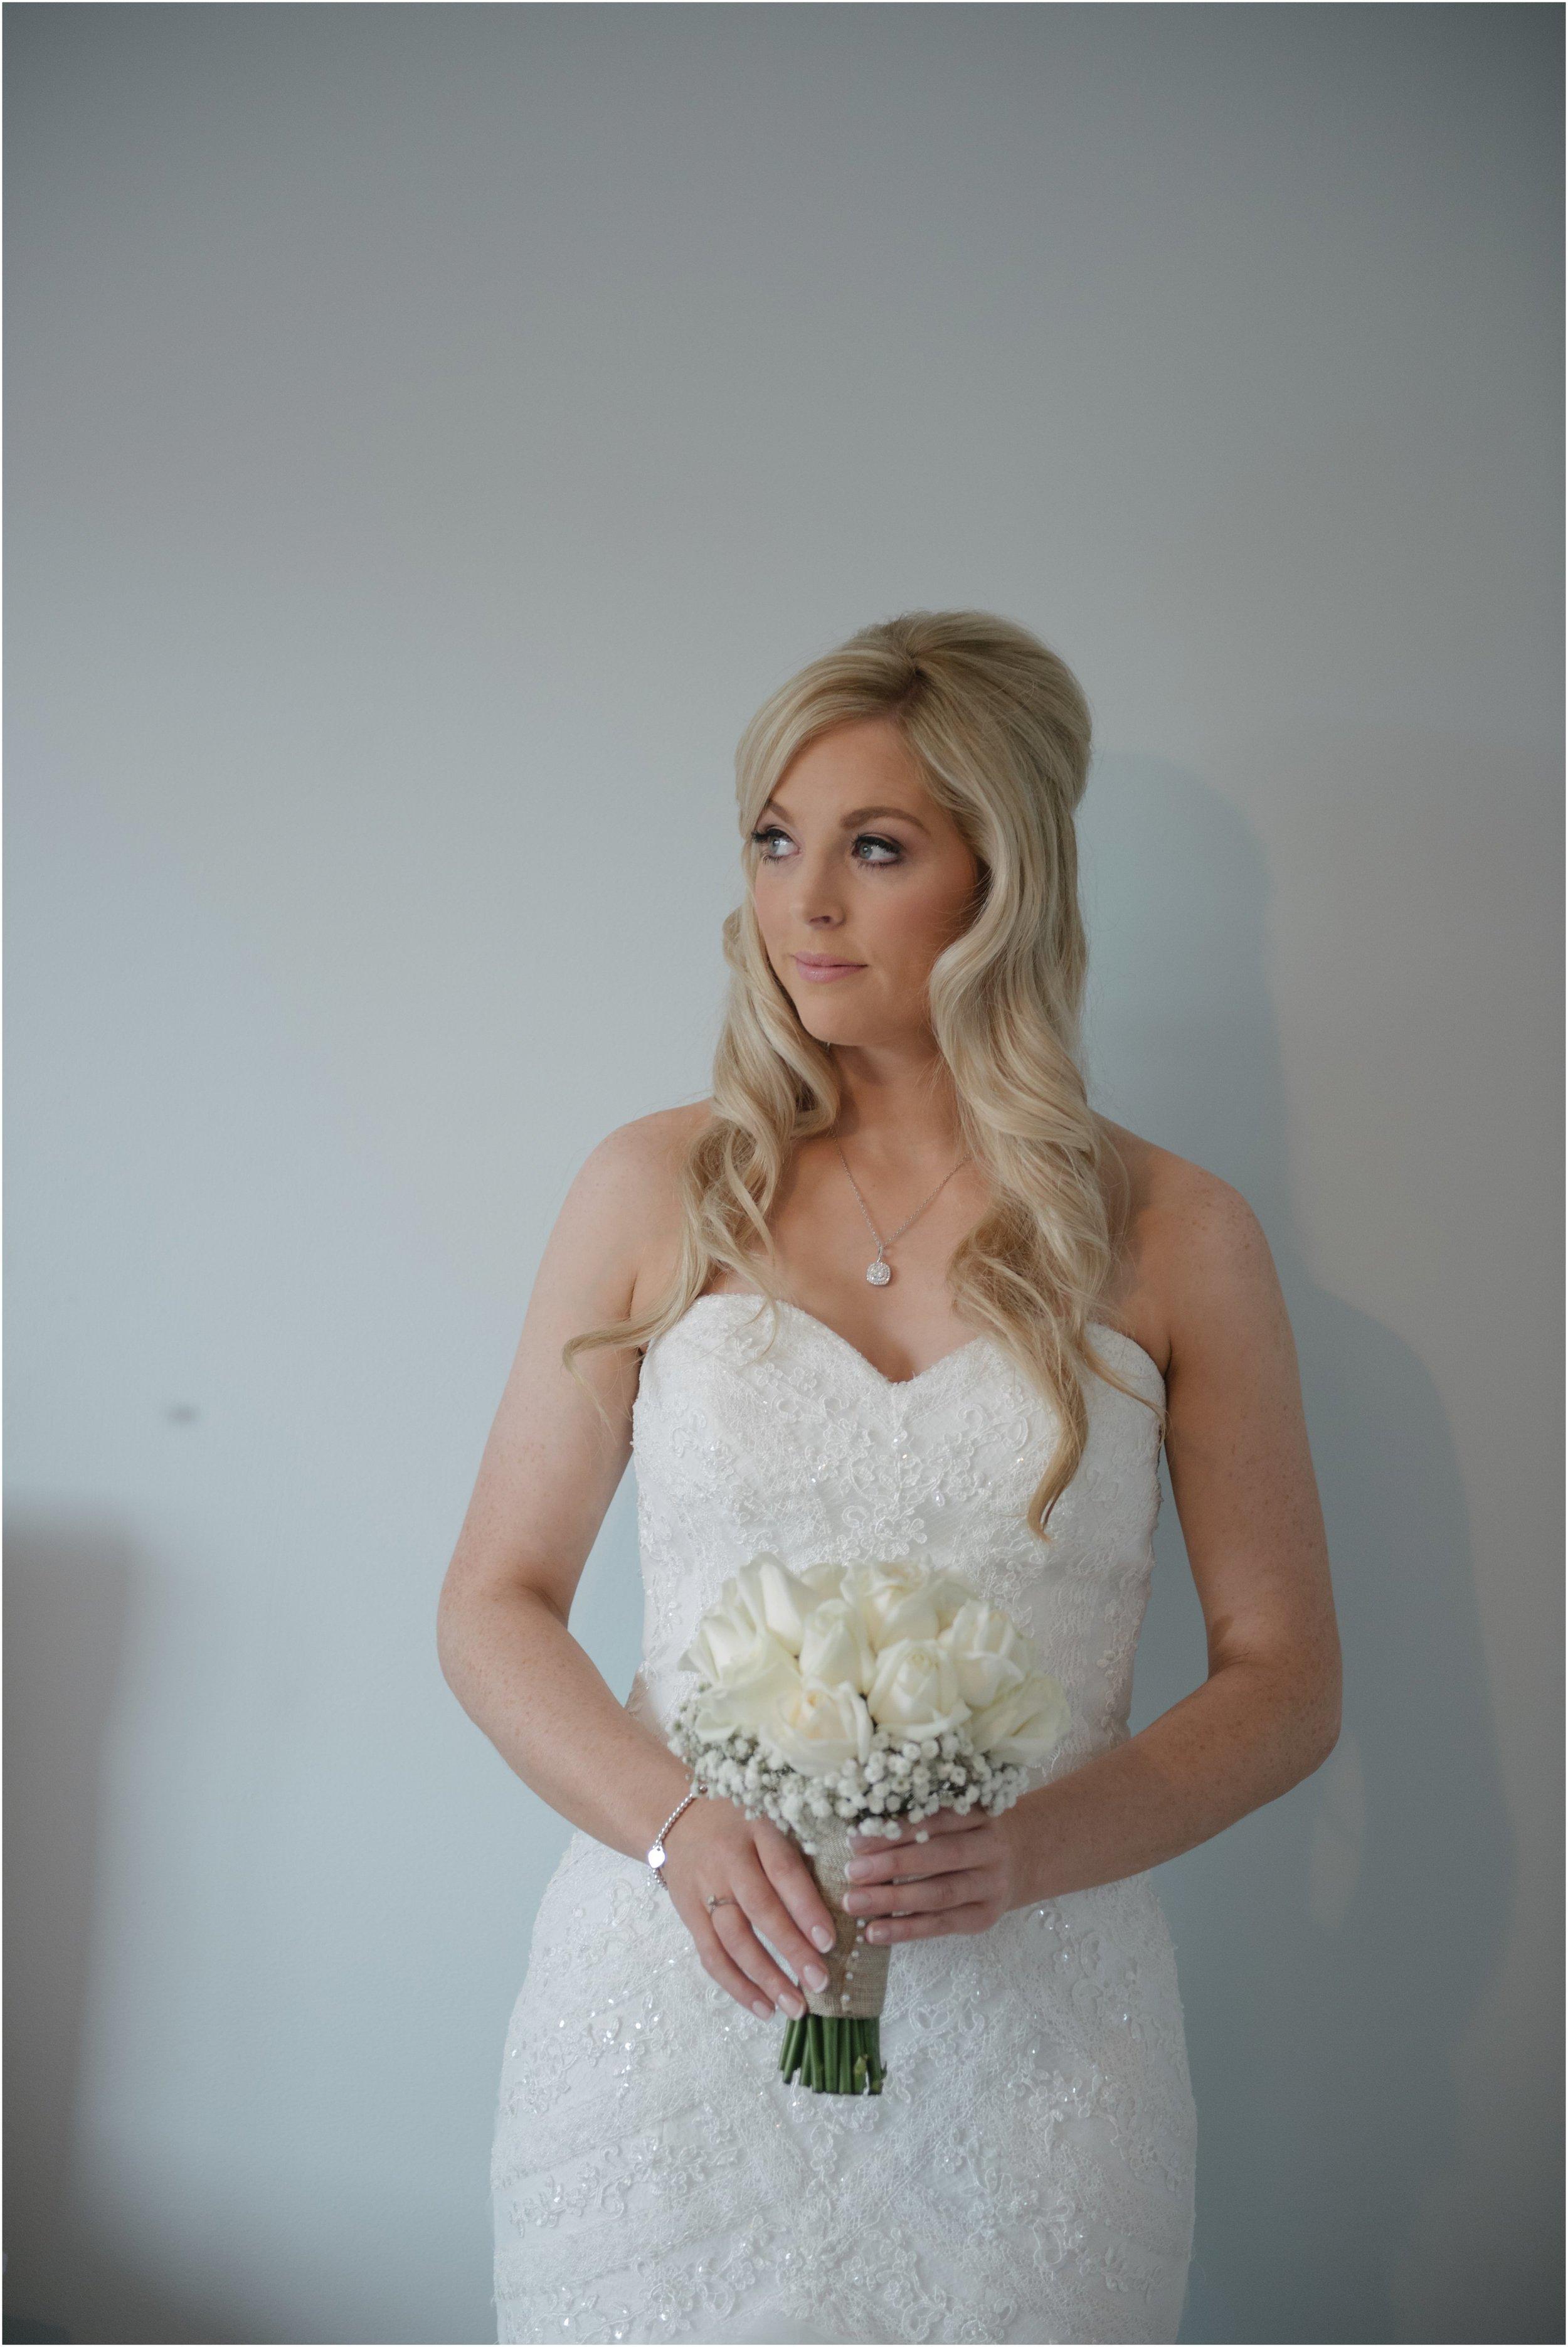 laura-lee-stephen-lough-erne-resort-wedding-photography-co-fermanagh_0013.jpg